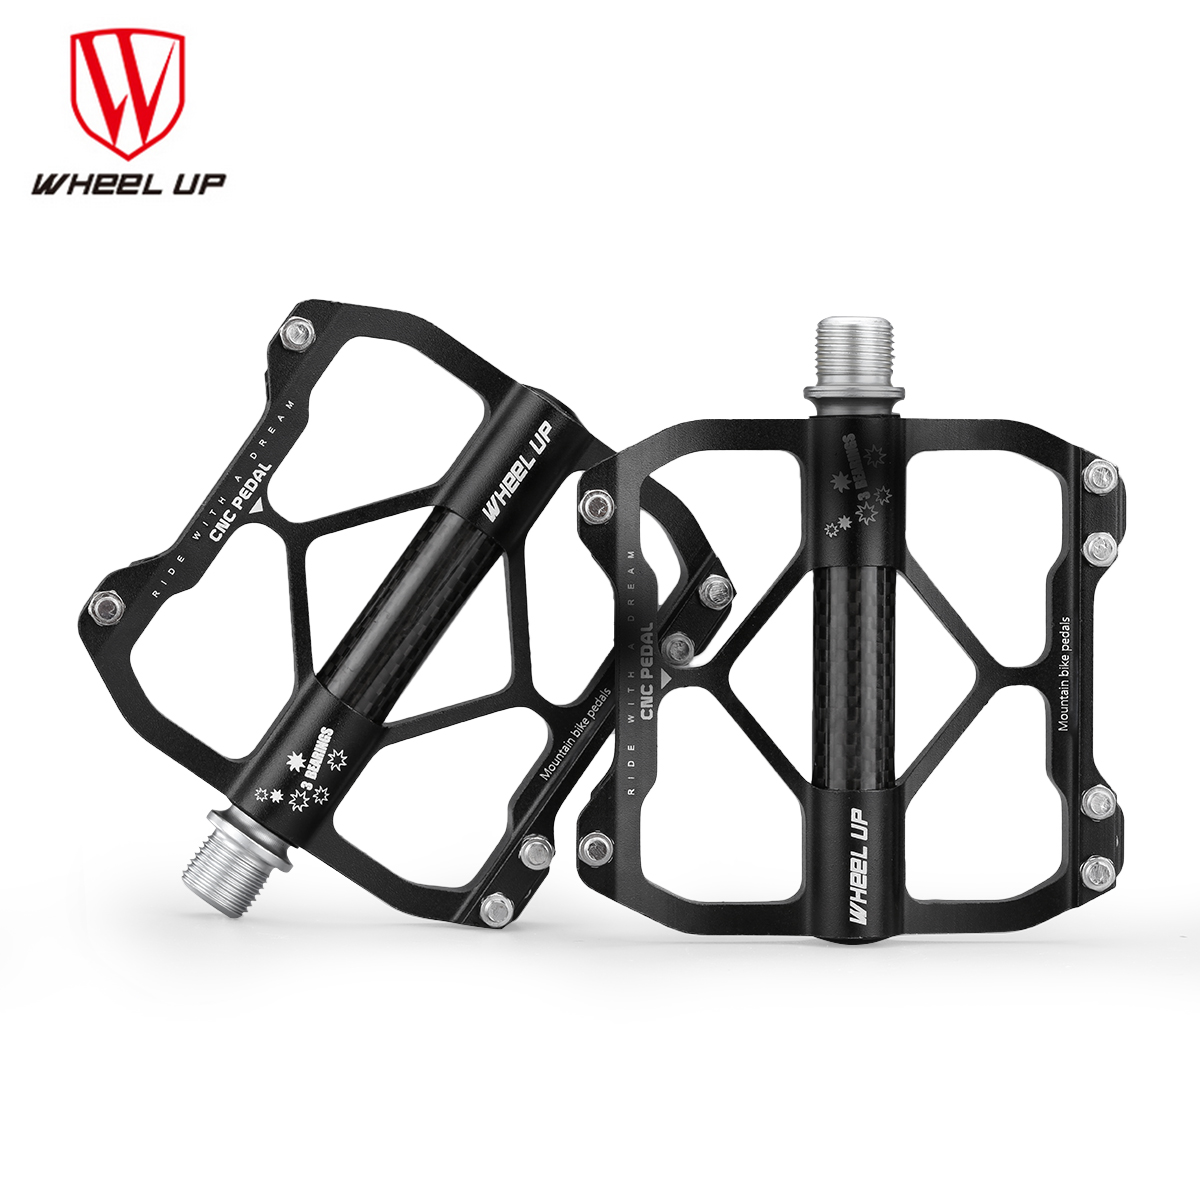 wheel up aluminium alloy carbon tube bike pedals mountain. Black Bedroom Furniture Sets. Home Design Ideas